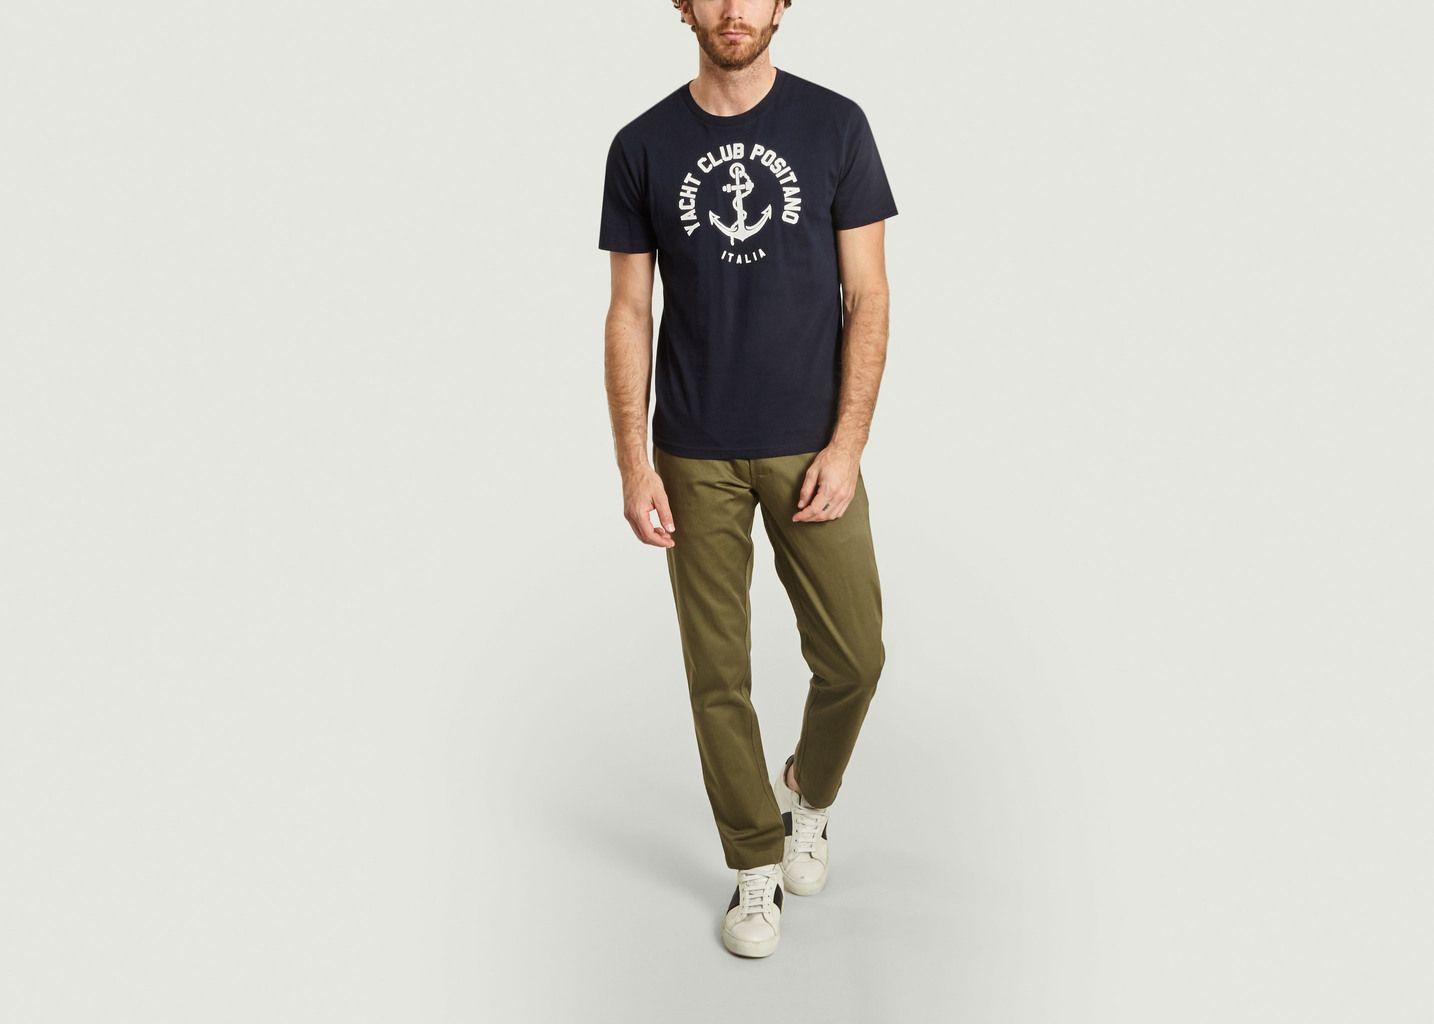 T-shirt imprimé Yacht Club Positano Italia - Harmony